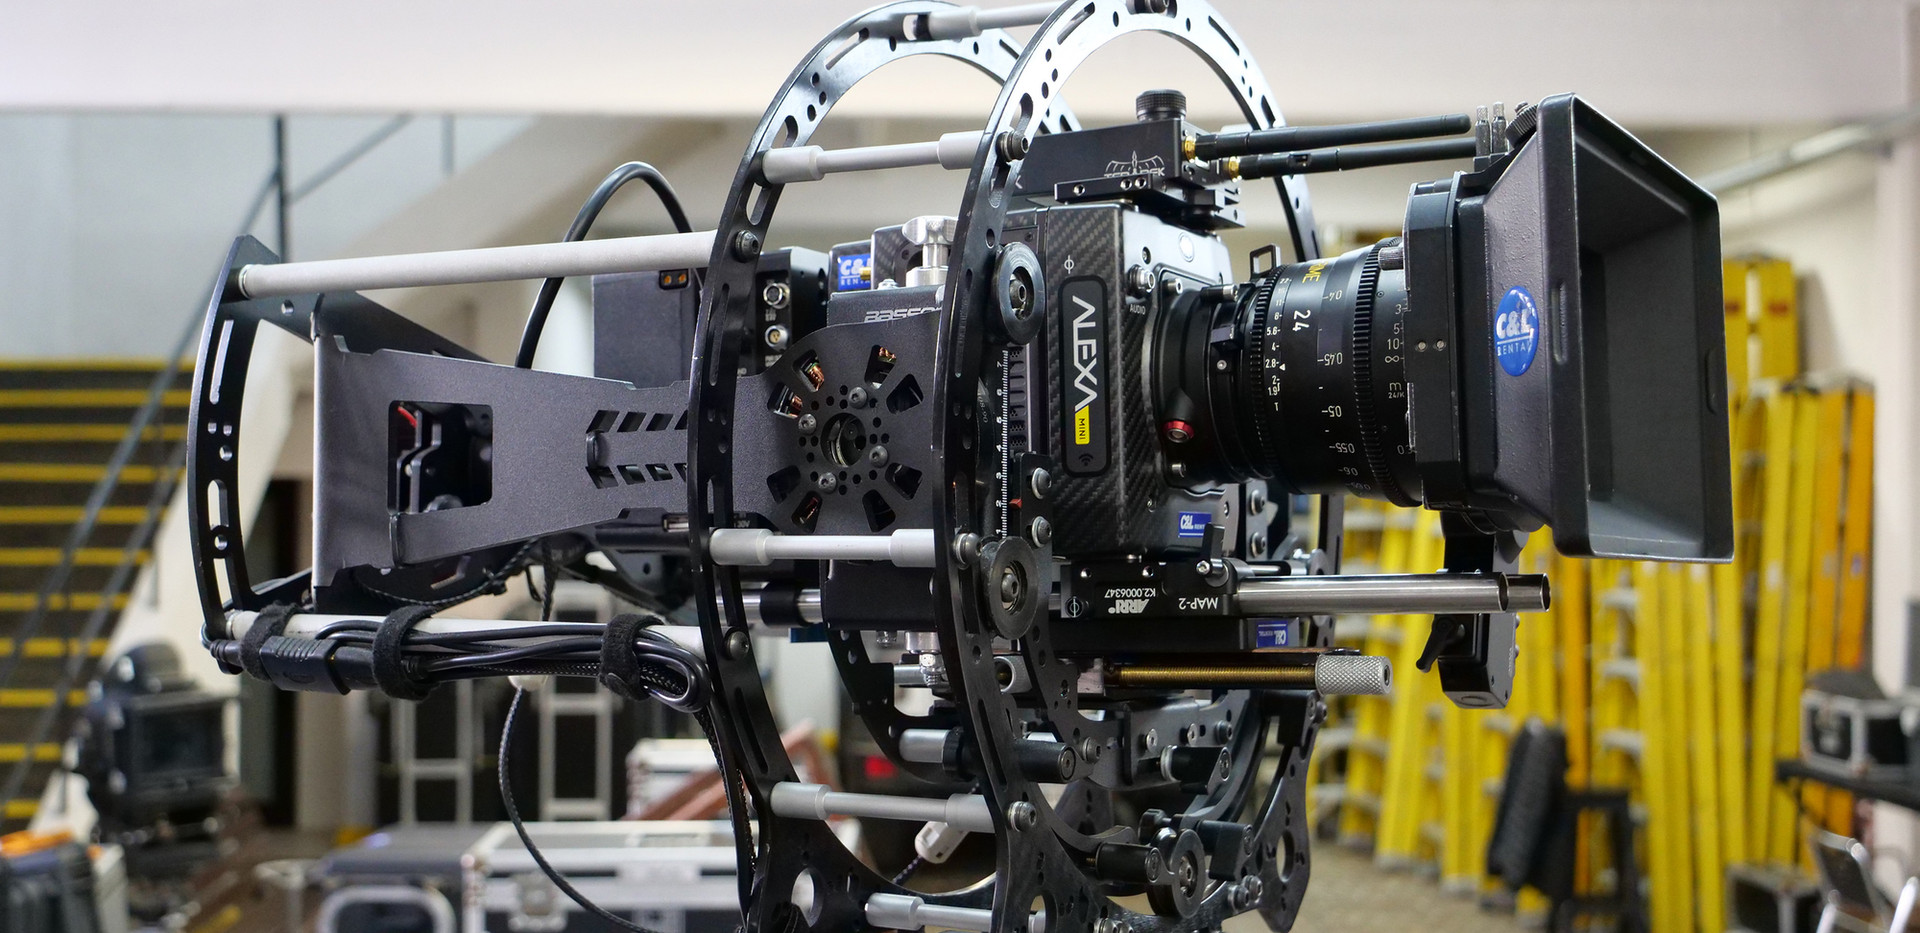 Hybrid Steadycam with carbon fiber Arri alexa mini on hybrid steadycam Endless 3 Basson Steady camera stabilizer